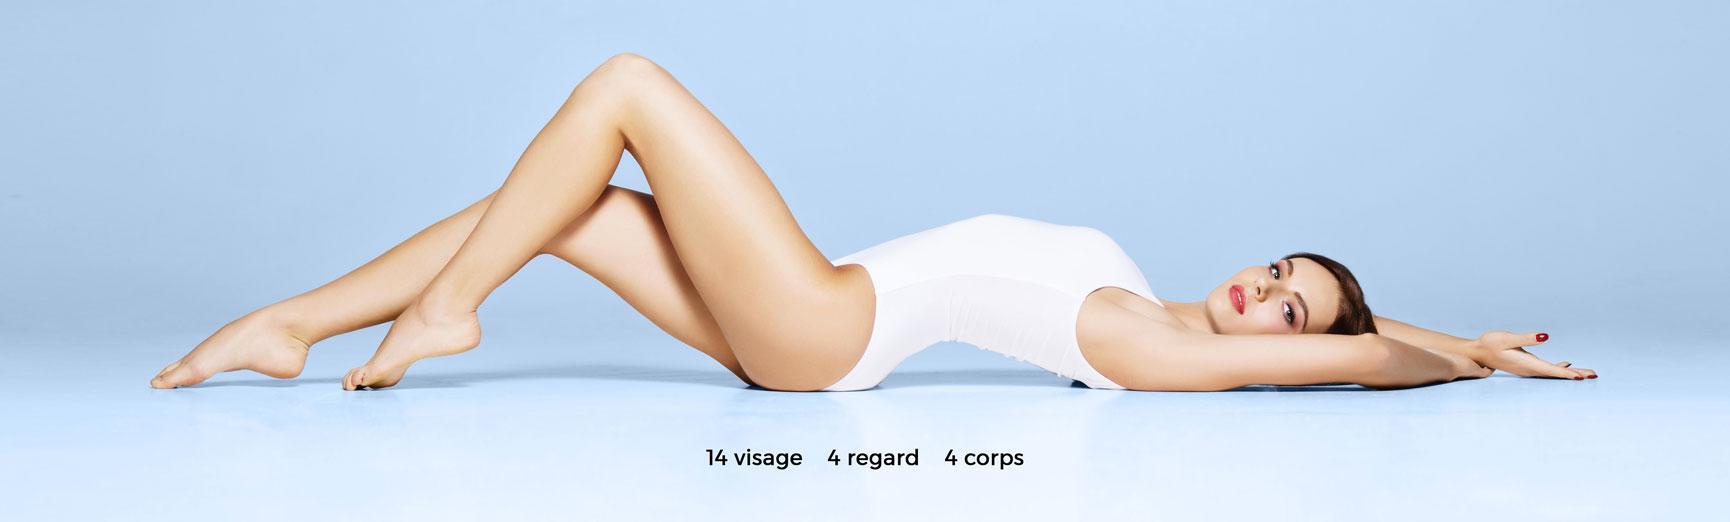 skintex-banner